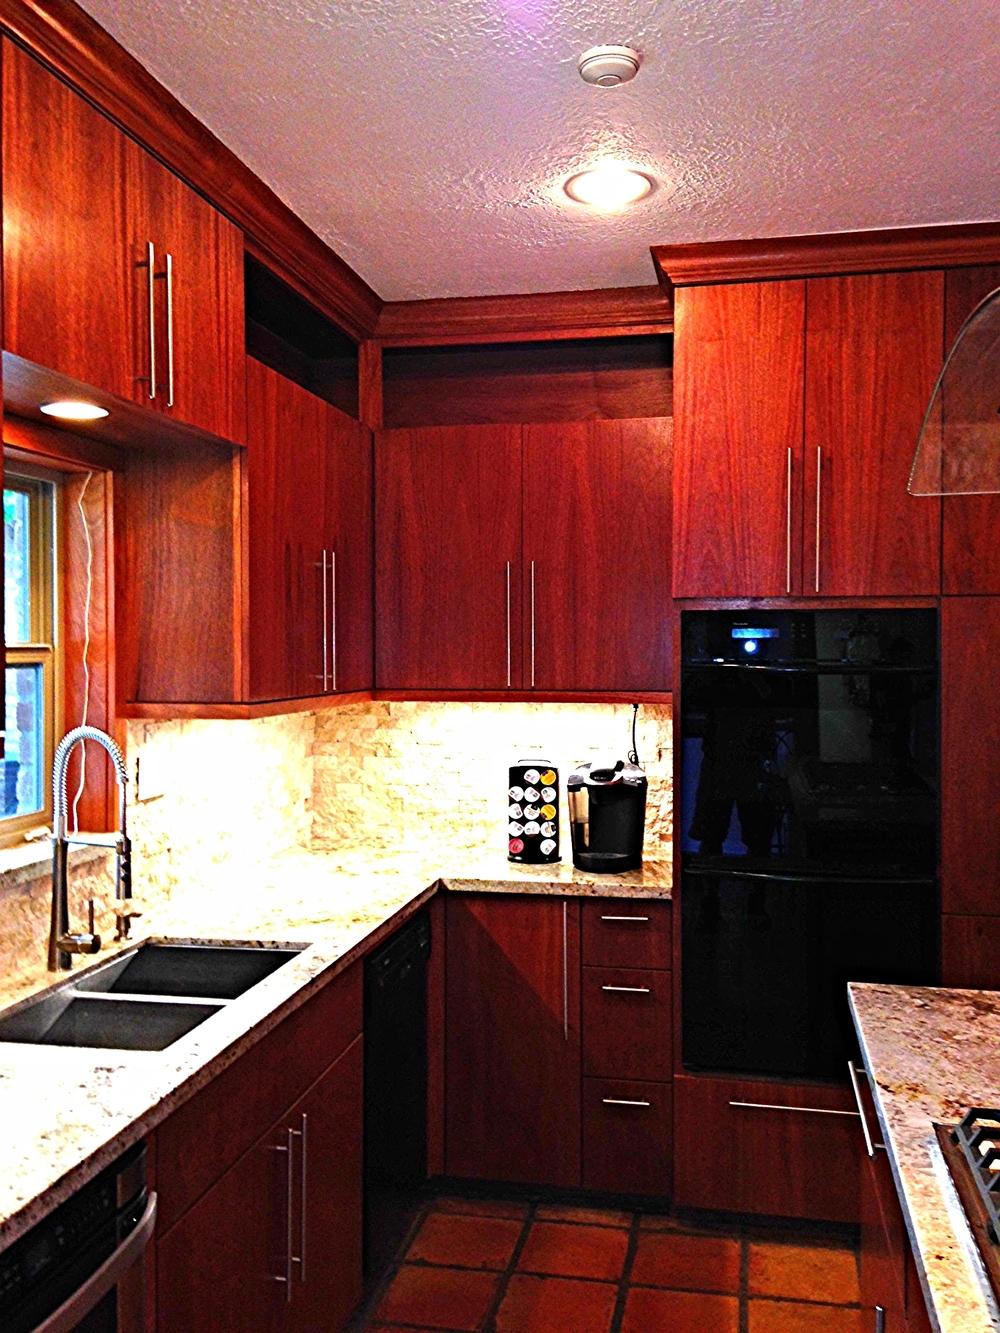 Bukolt kitchen remodel view three